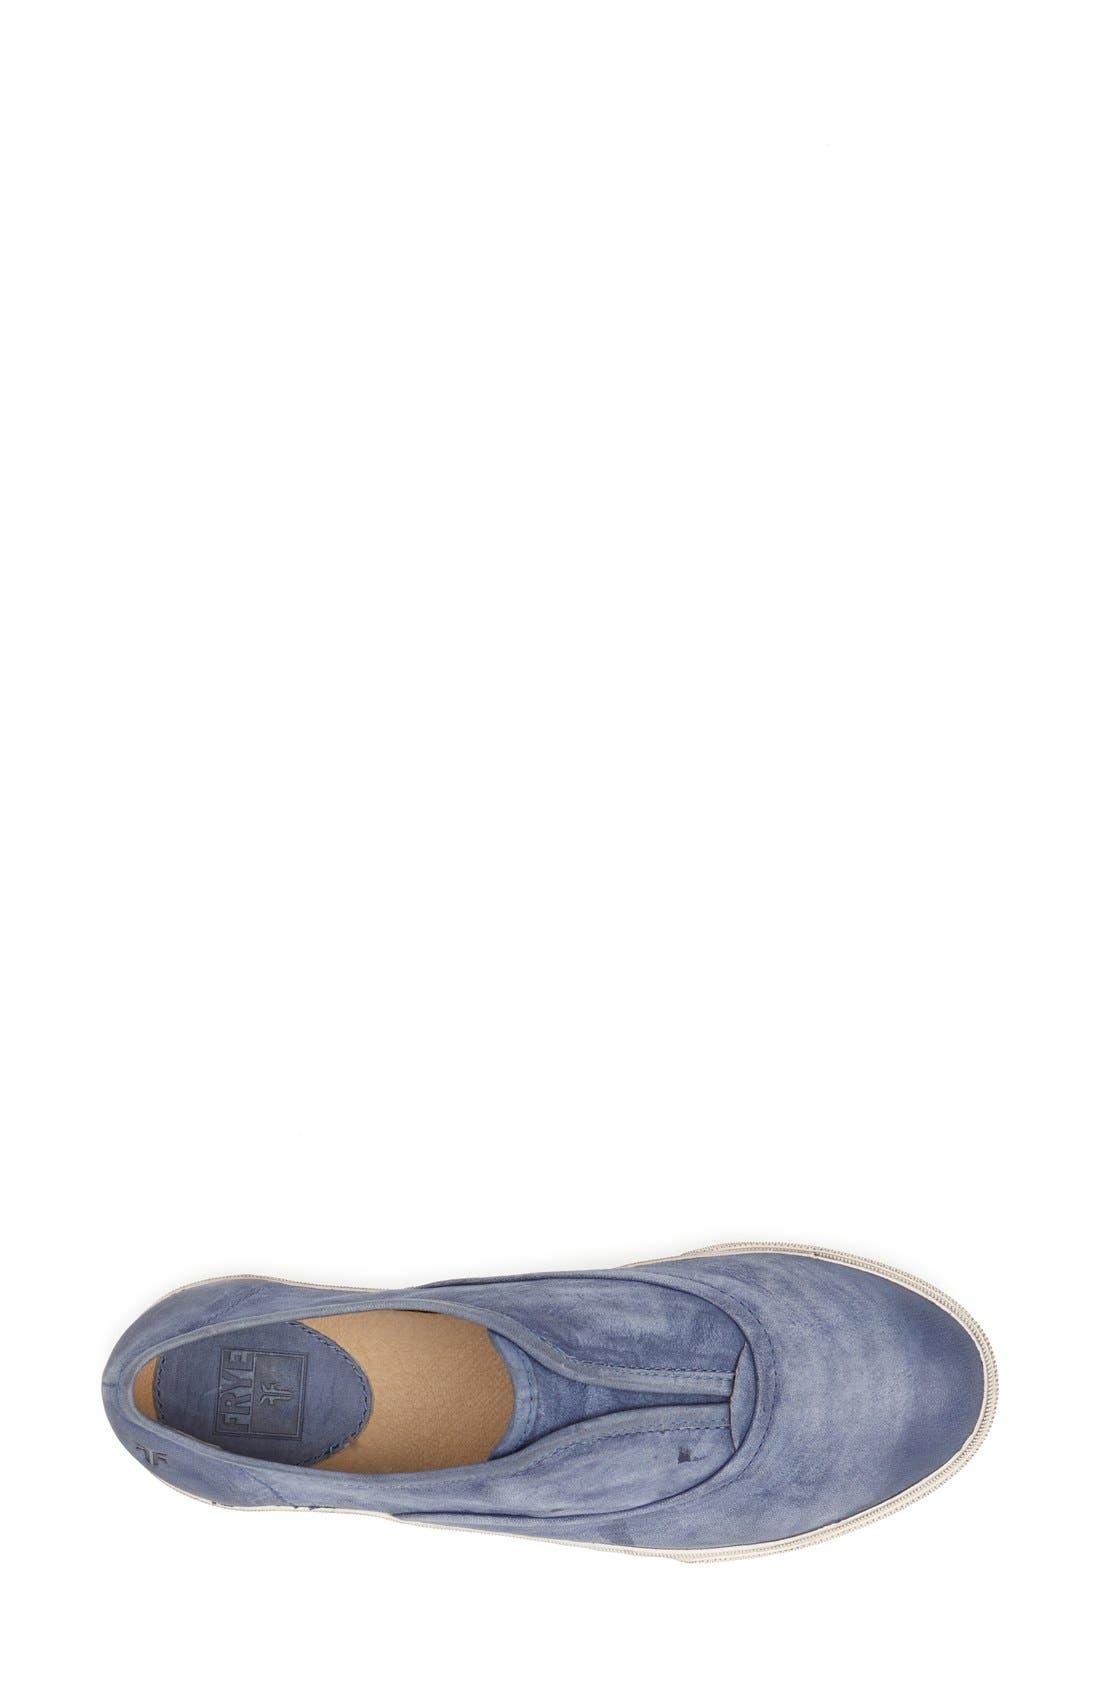 Alternate Image 4  - Frye 'Mindy' Slip-On Leather Sneaker (Women)